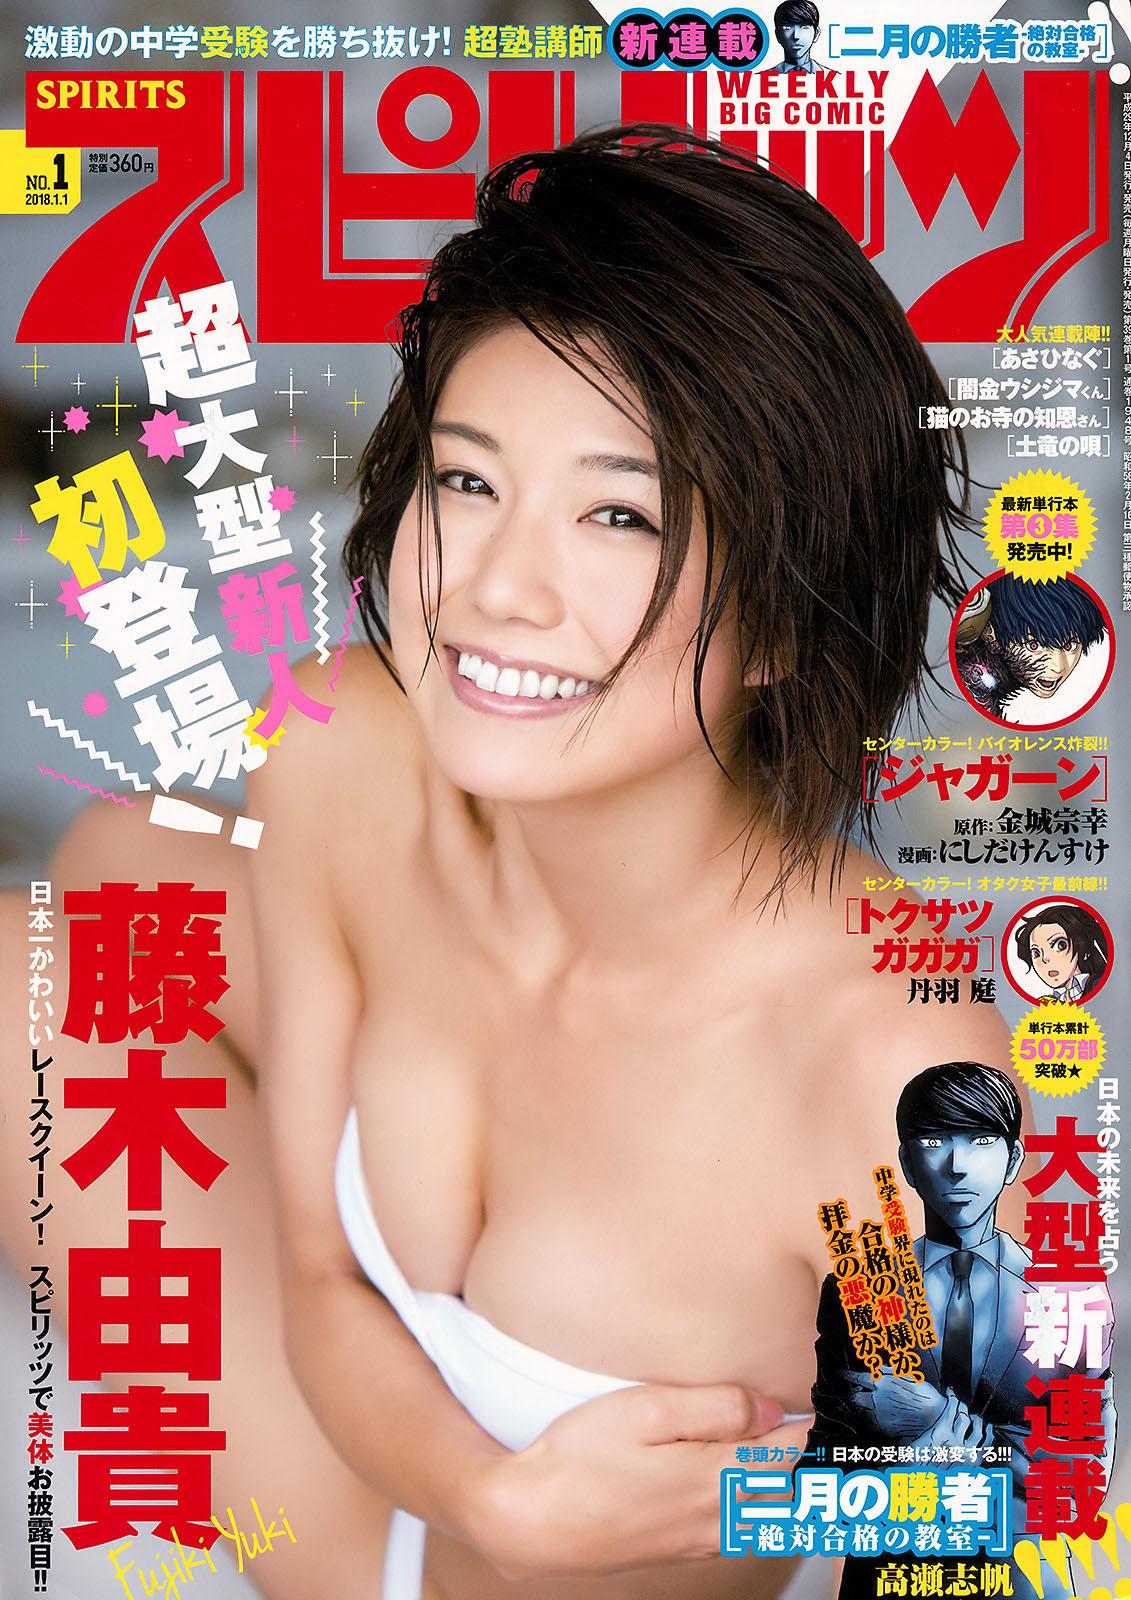 Yuki Fujiki 藤木由貴, Big Comic Spirits 2018 No.01 (週刊スピリッツ 2018年01号)